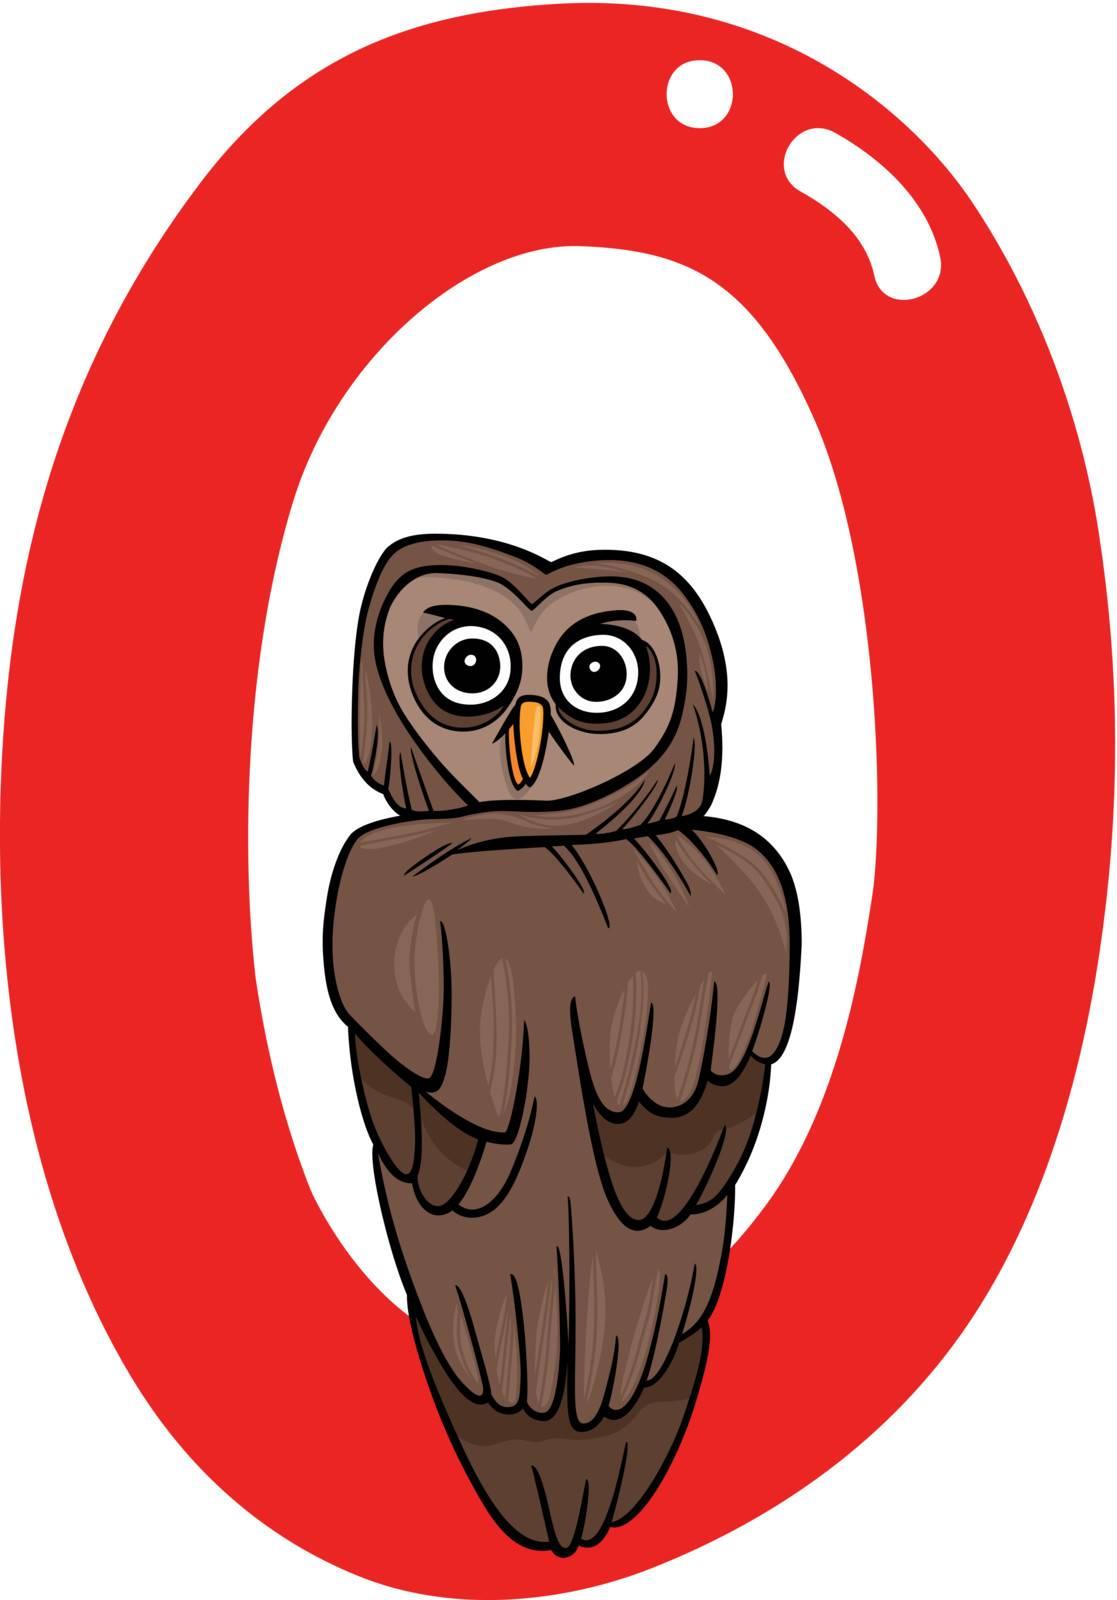 cartoon illustration of O letter for owl